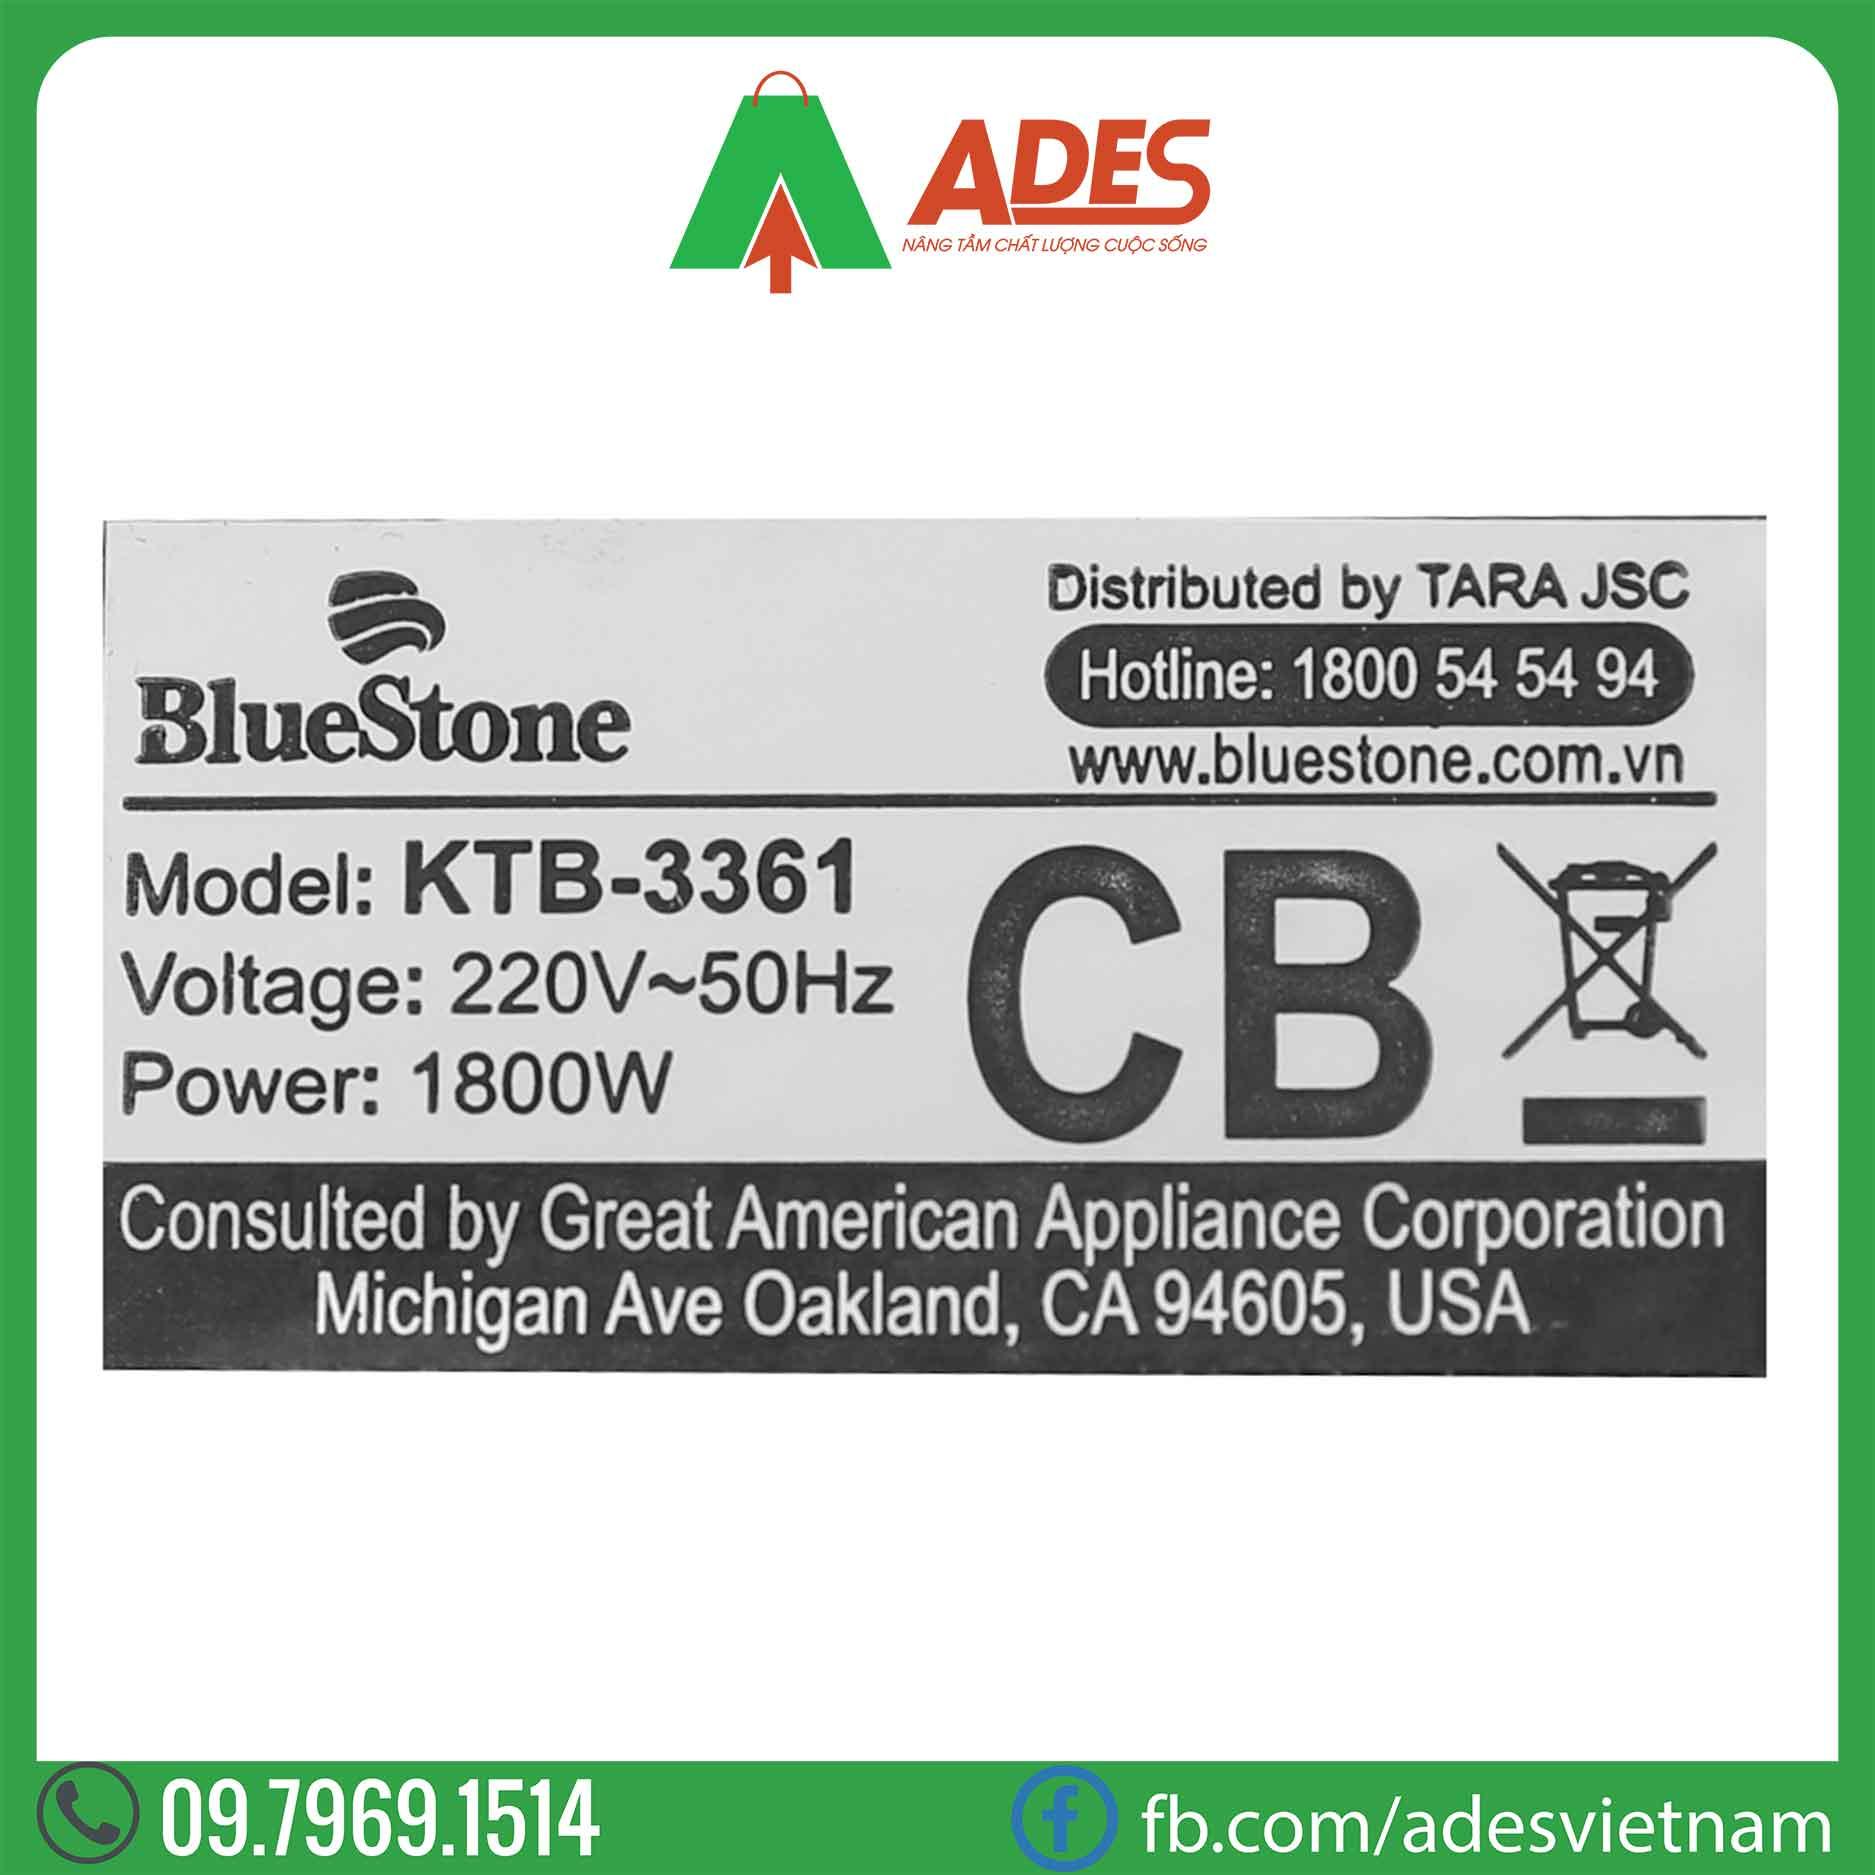 Am sieu toc Bluestone KTB-3361